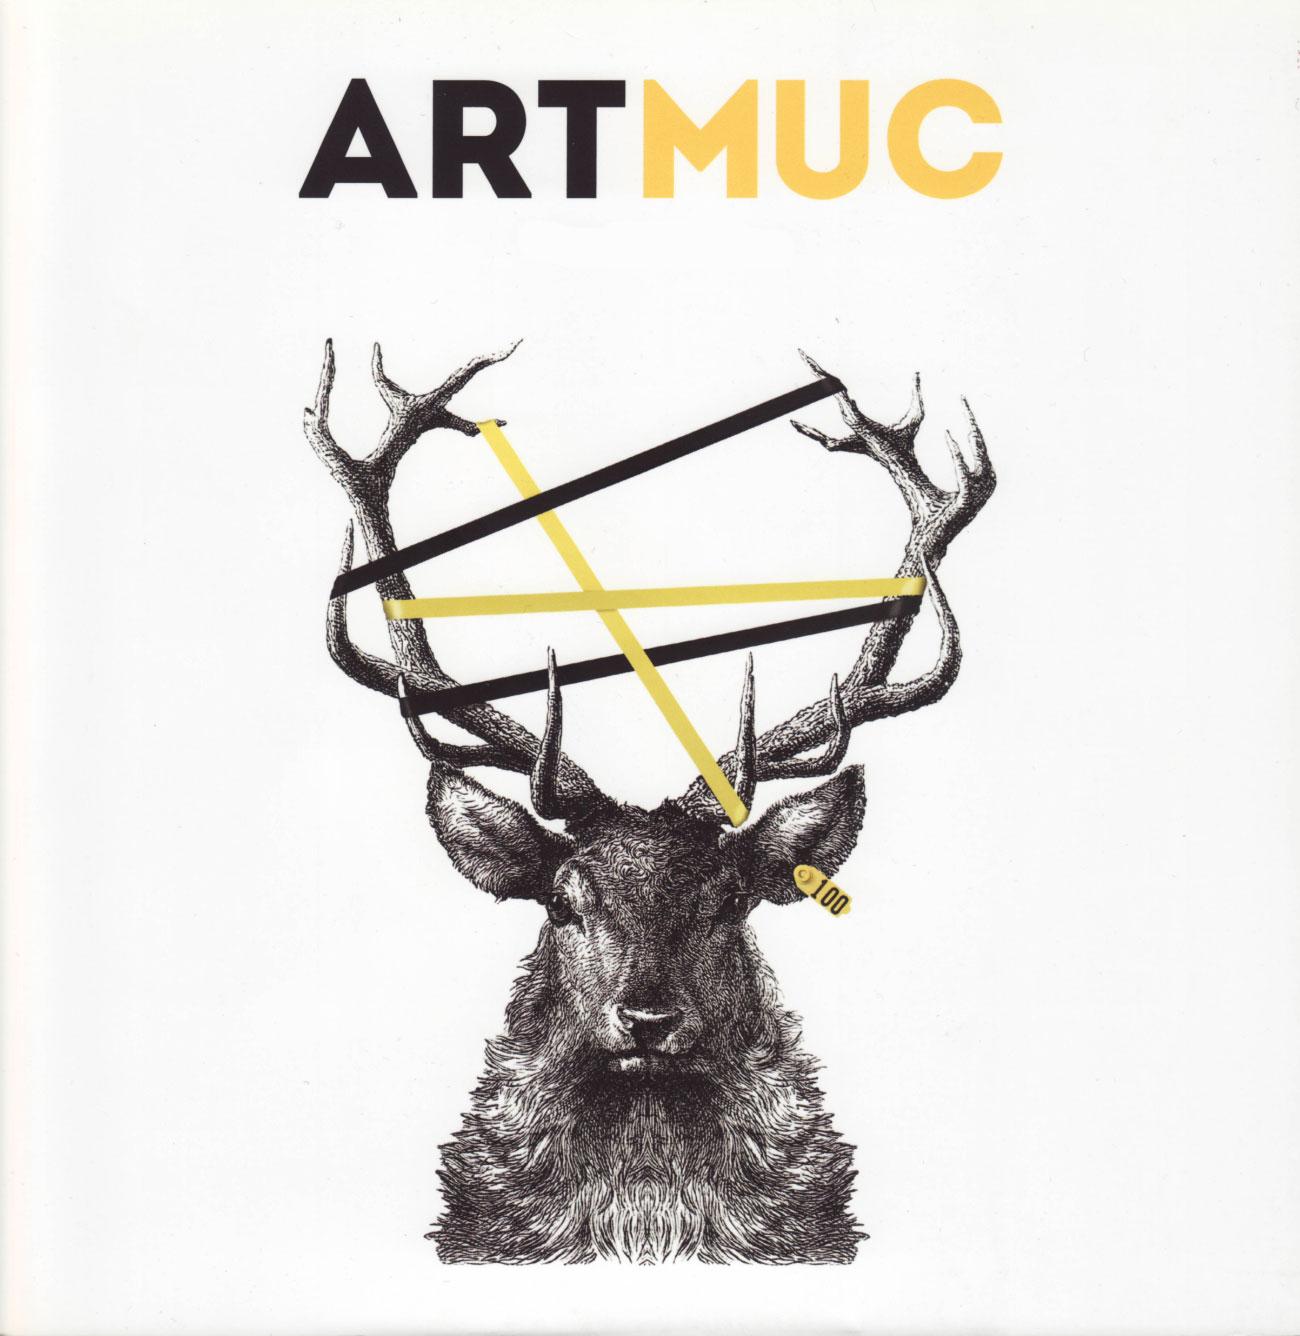 Artmuc